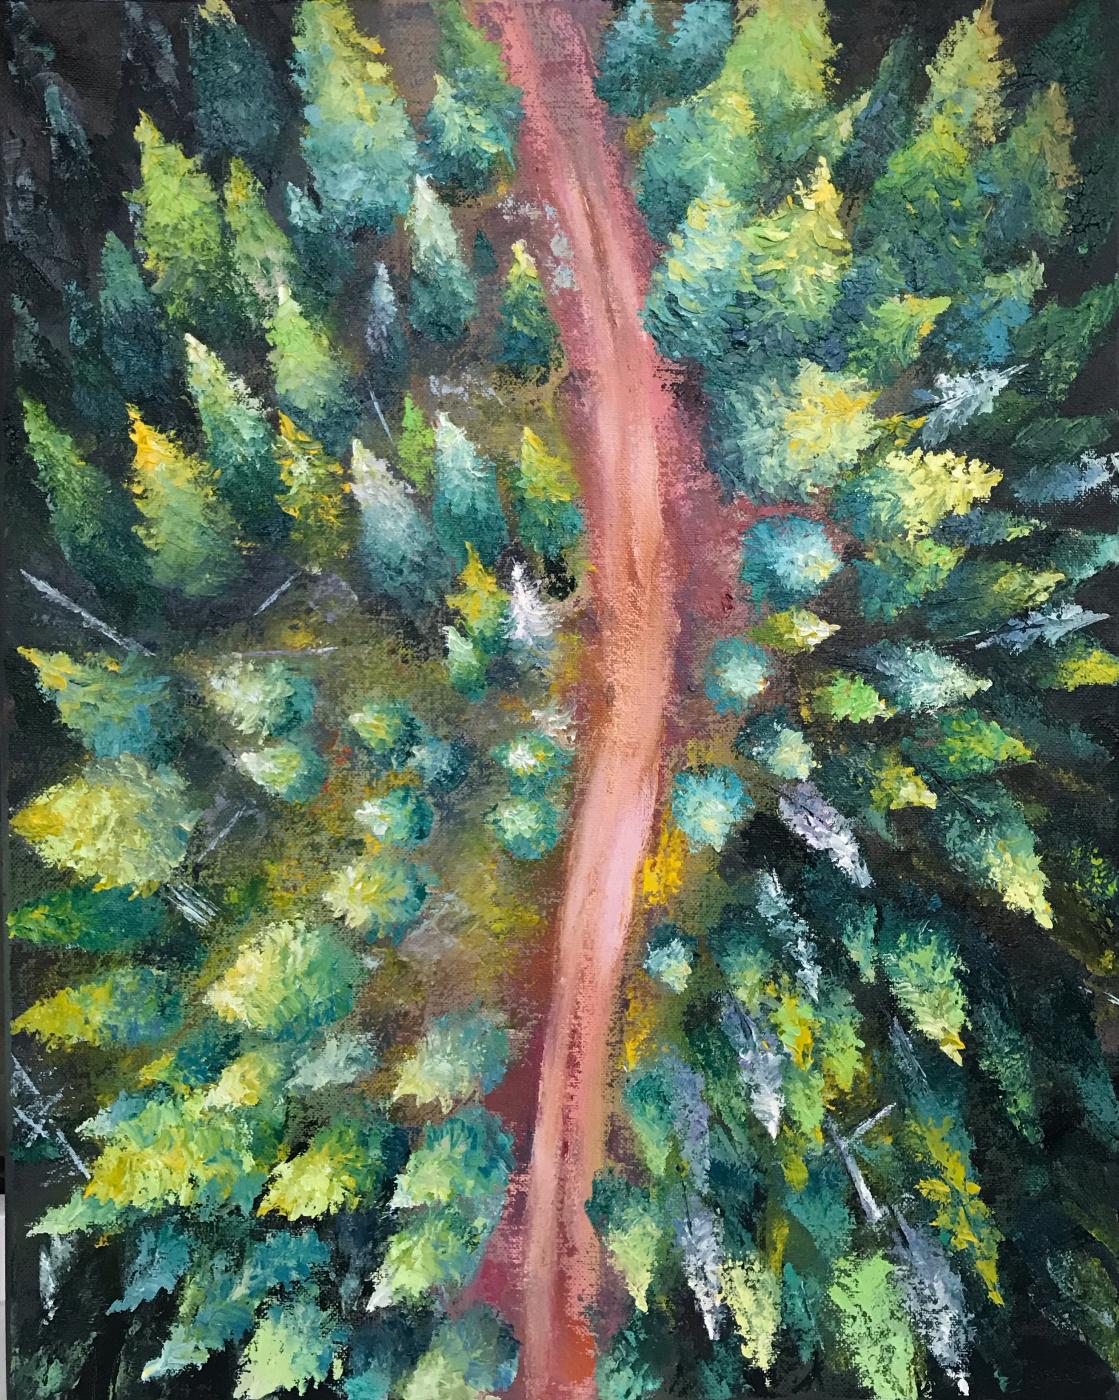 Anastasia Oraina. Over the forest